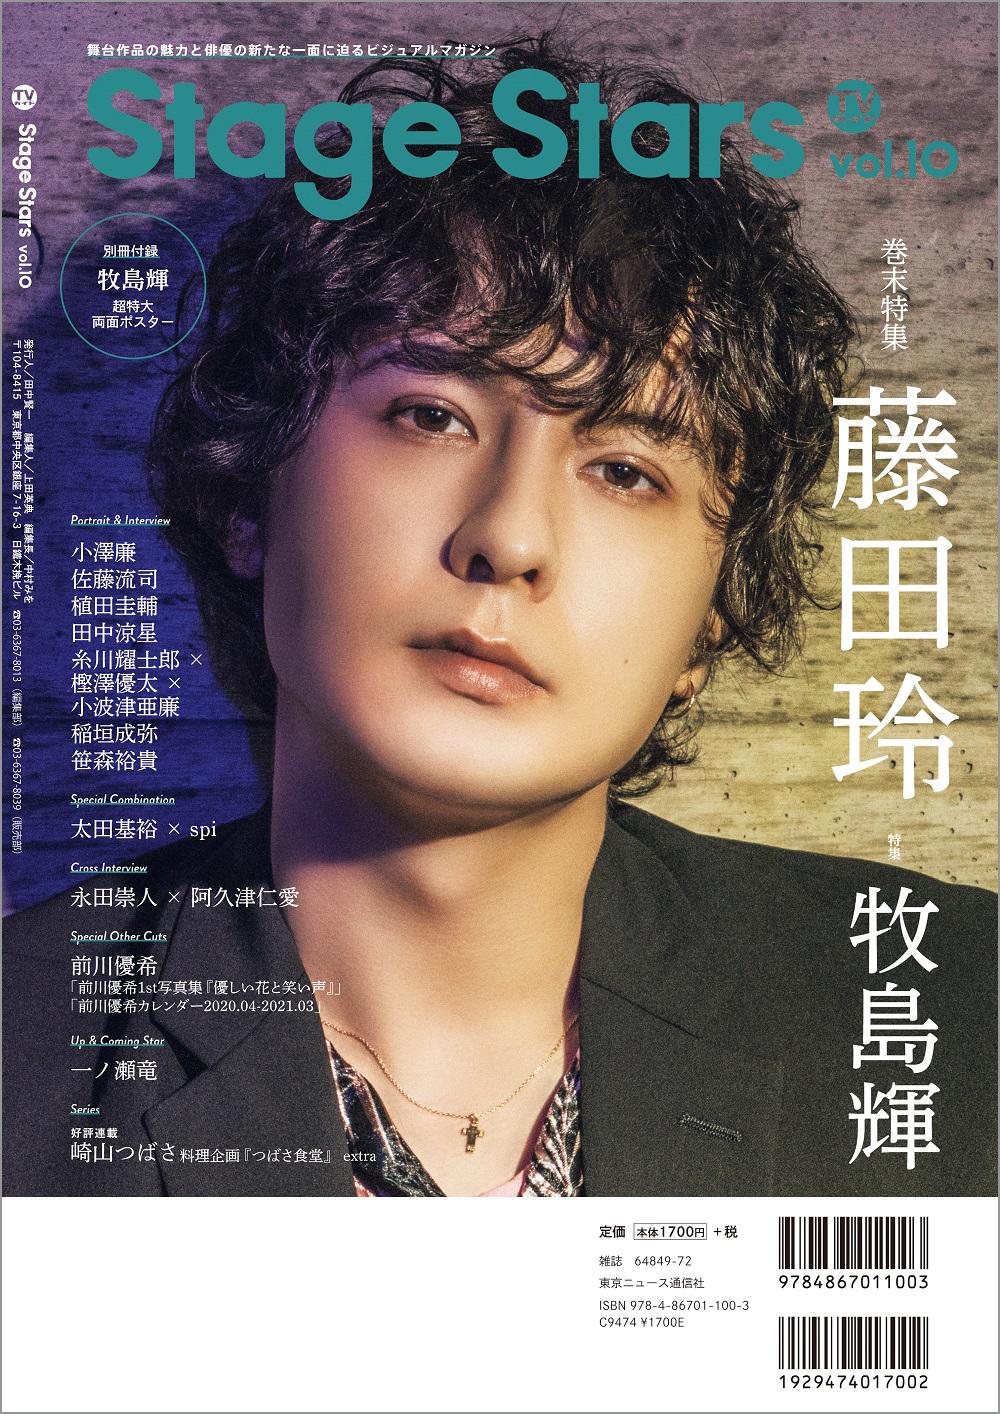 「TVガイド Stage Stars vol.10」(東京ニュース通信社)の裏表紙